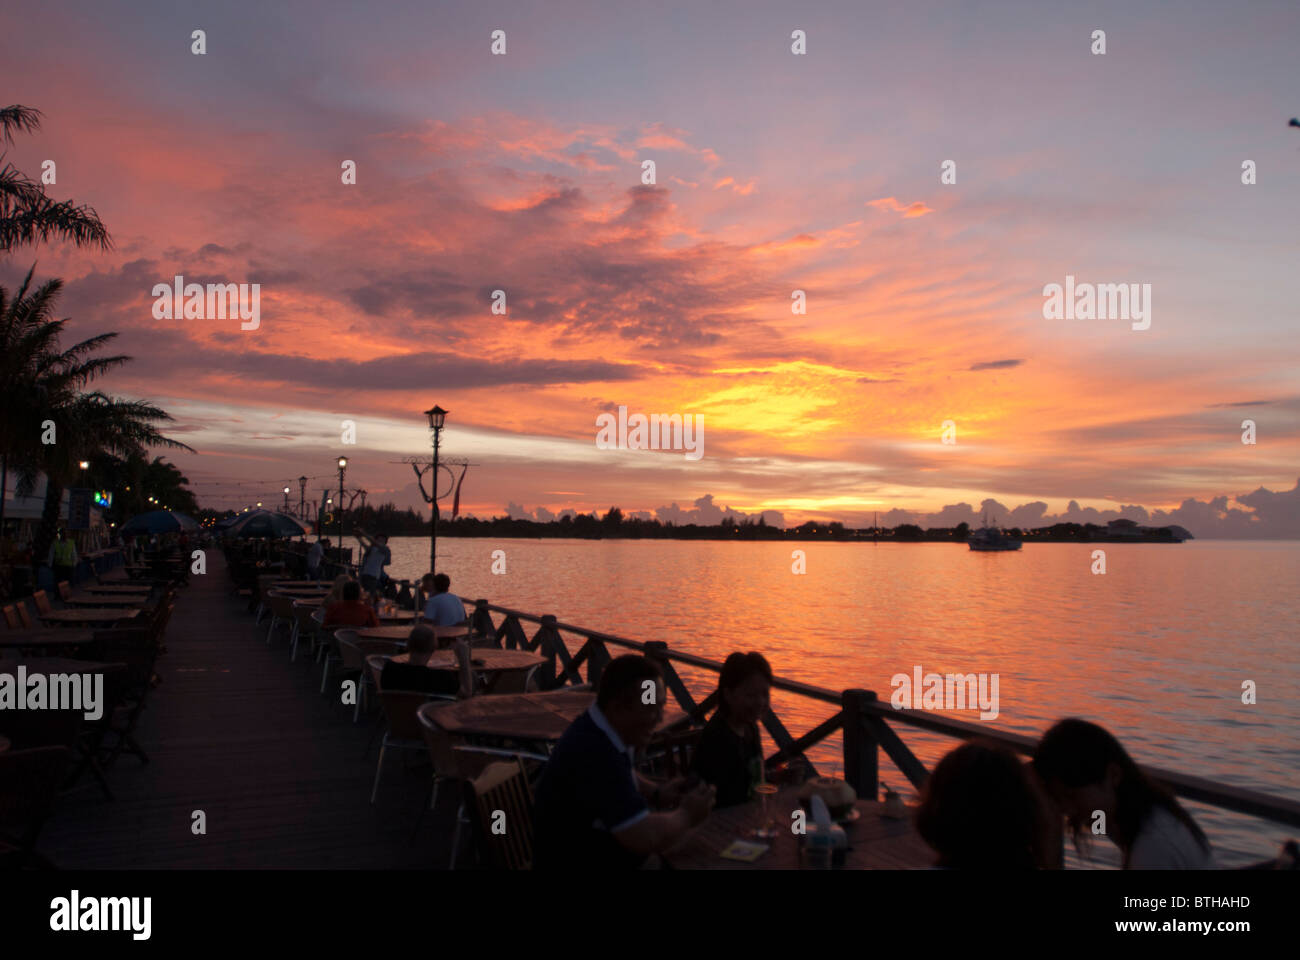 Sunset in Kota Kinabalu Borneo Malaysia - Stock Image